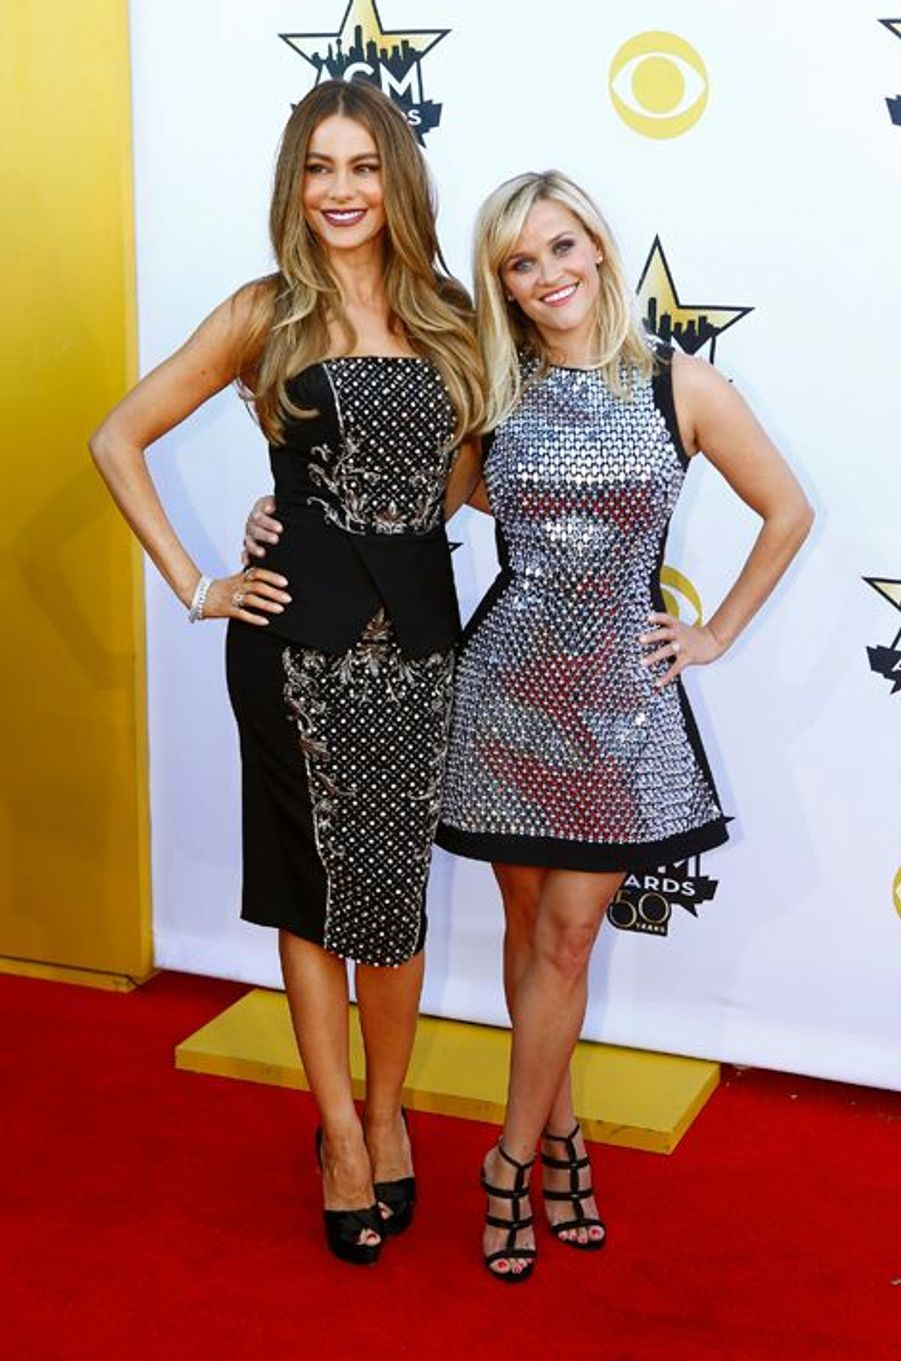 Sofia Vergara et Reese Witherspoon